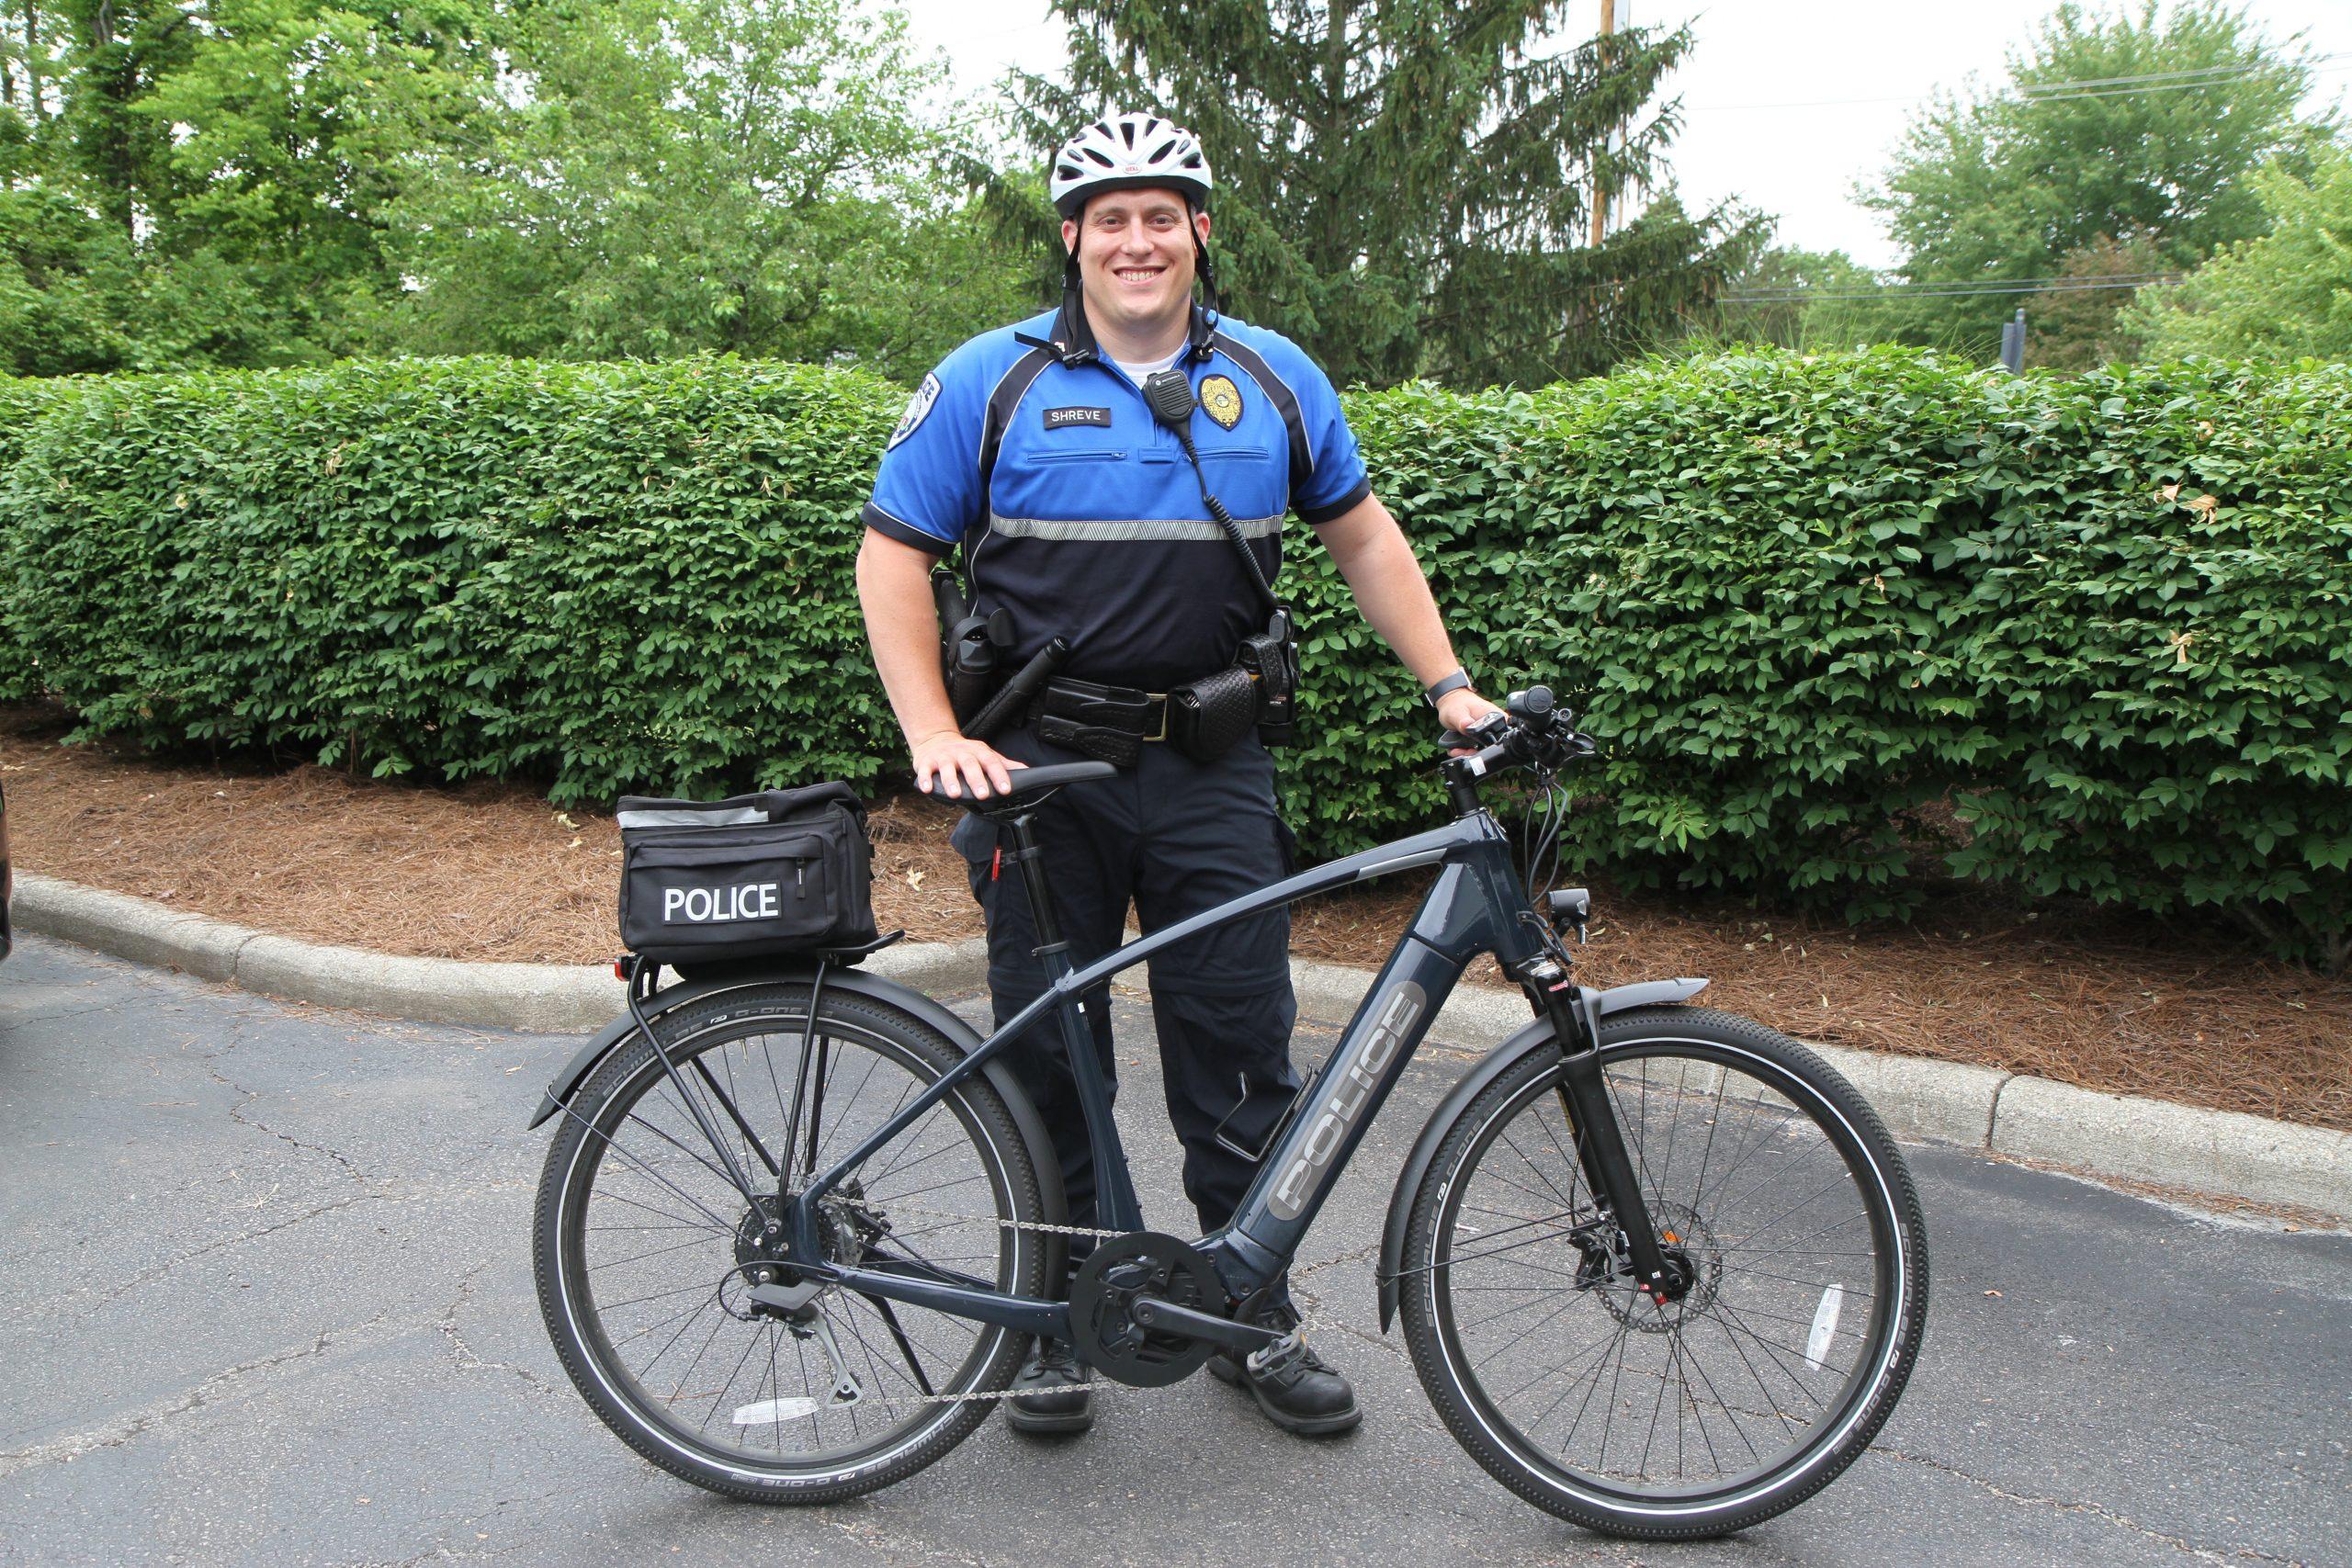 PD Bike Patrol